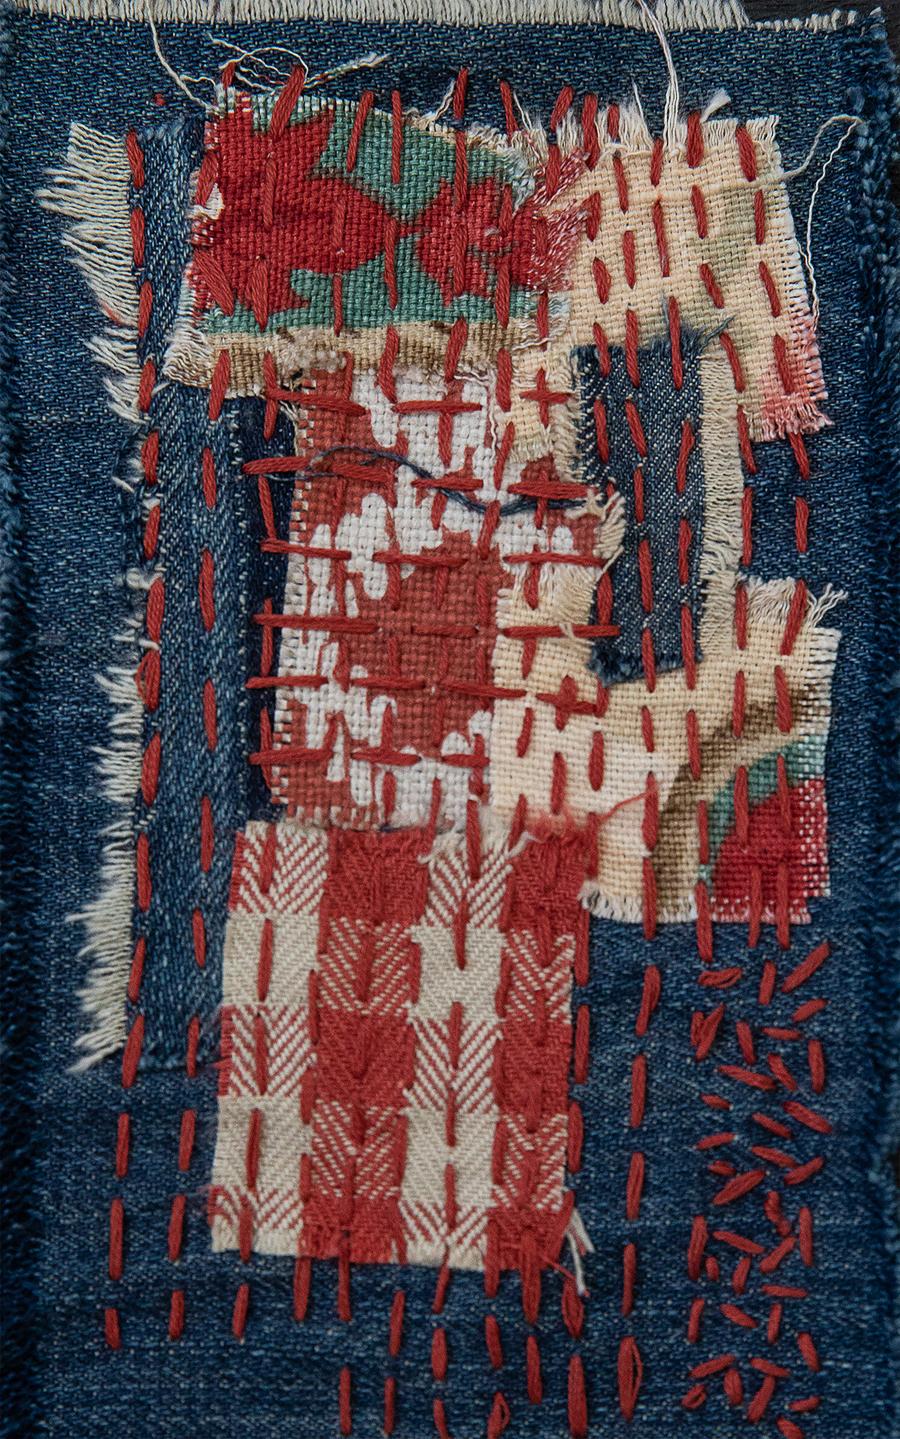 make-art-life-blog-patches-7